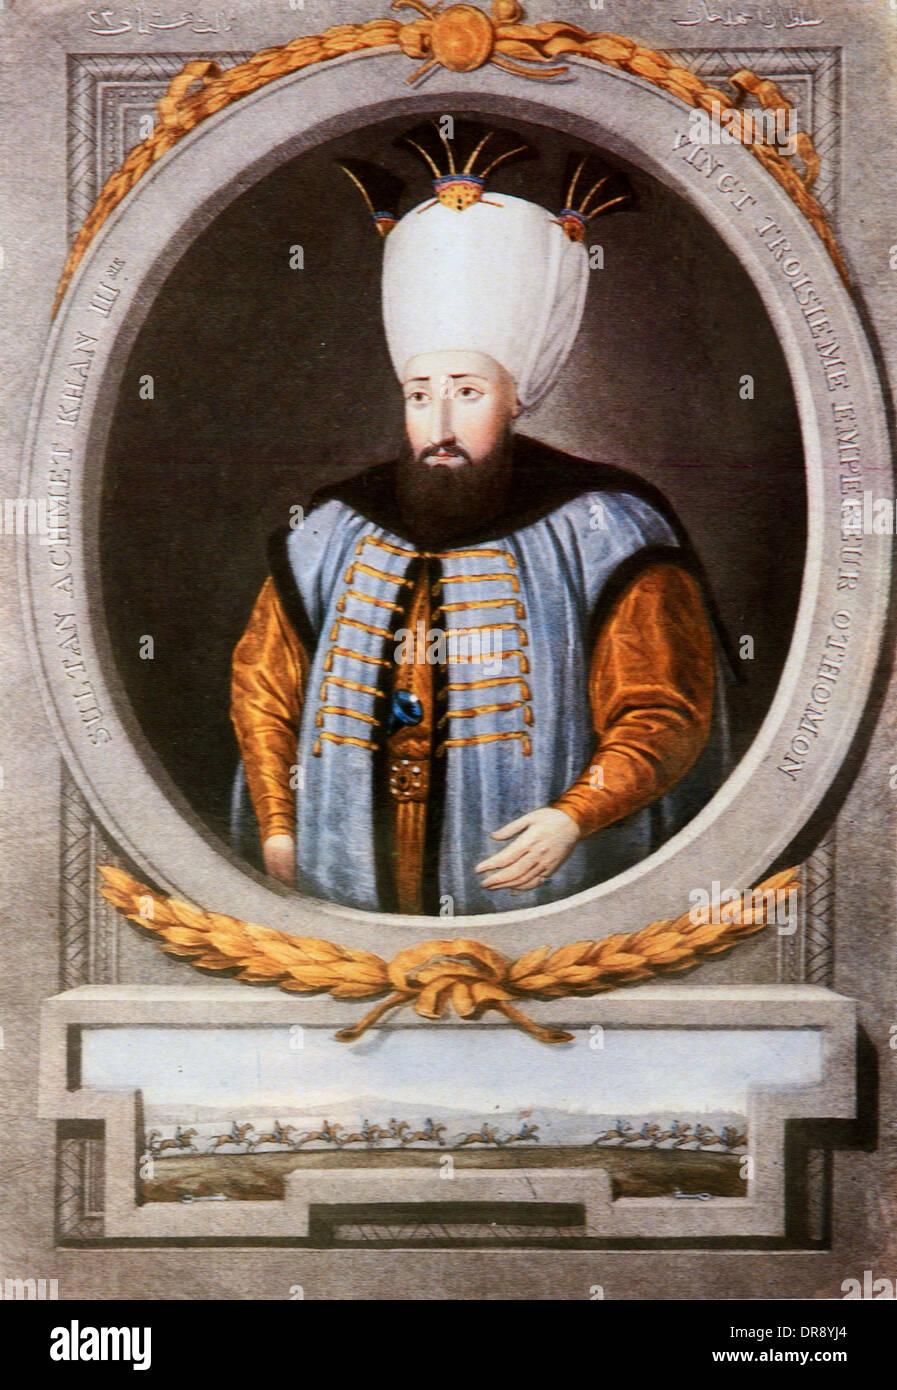 Turkish Ottoman Sultan Ahmed III (1673-1736) Portrait ...